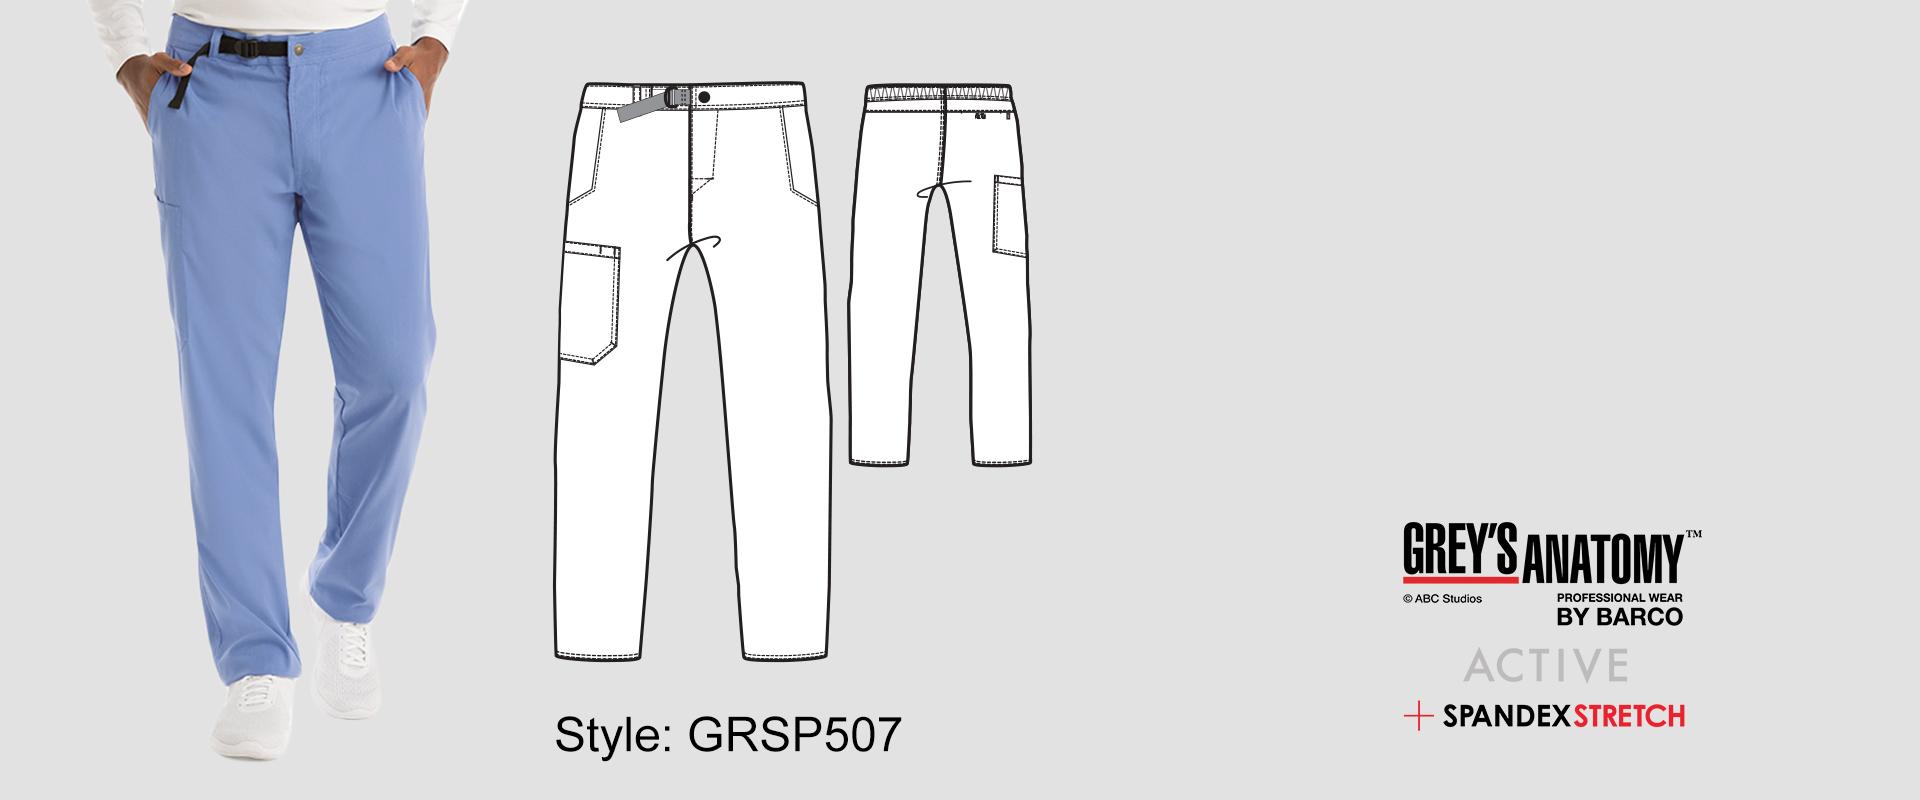 (GRSP507) Scrub Pants